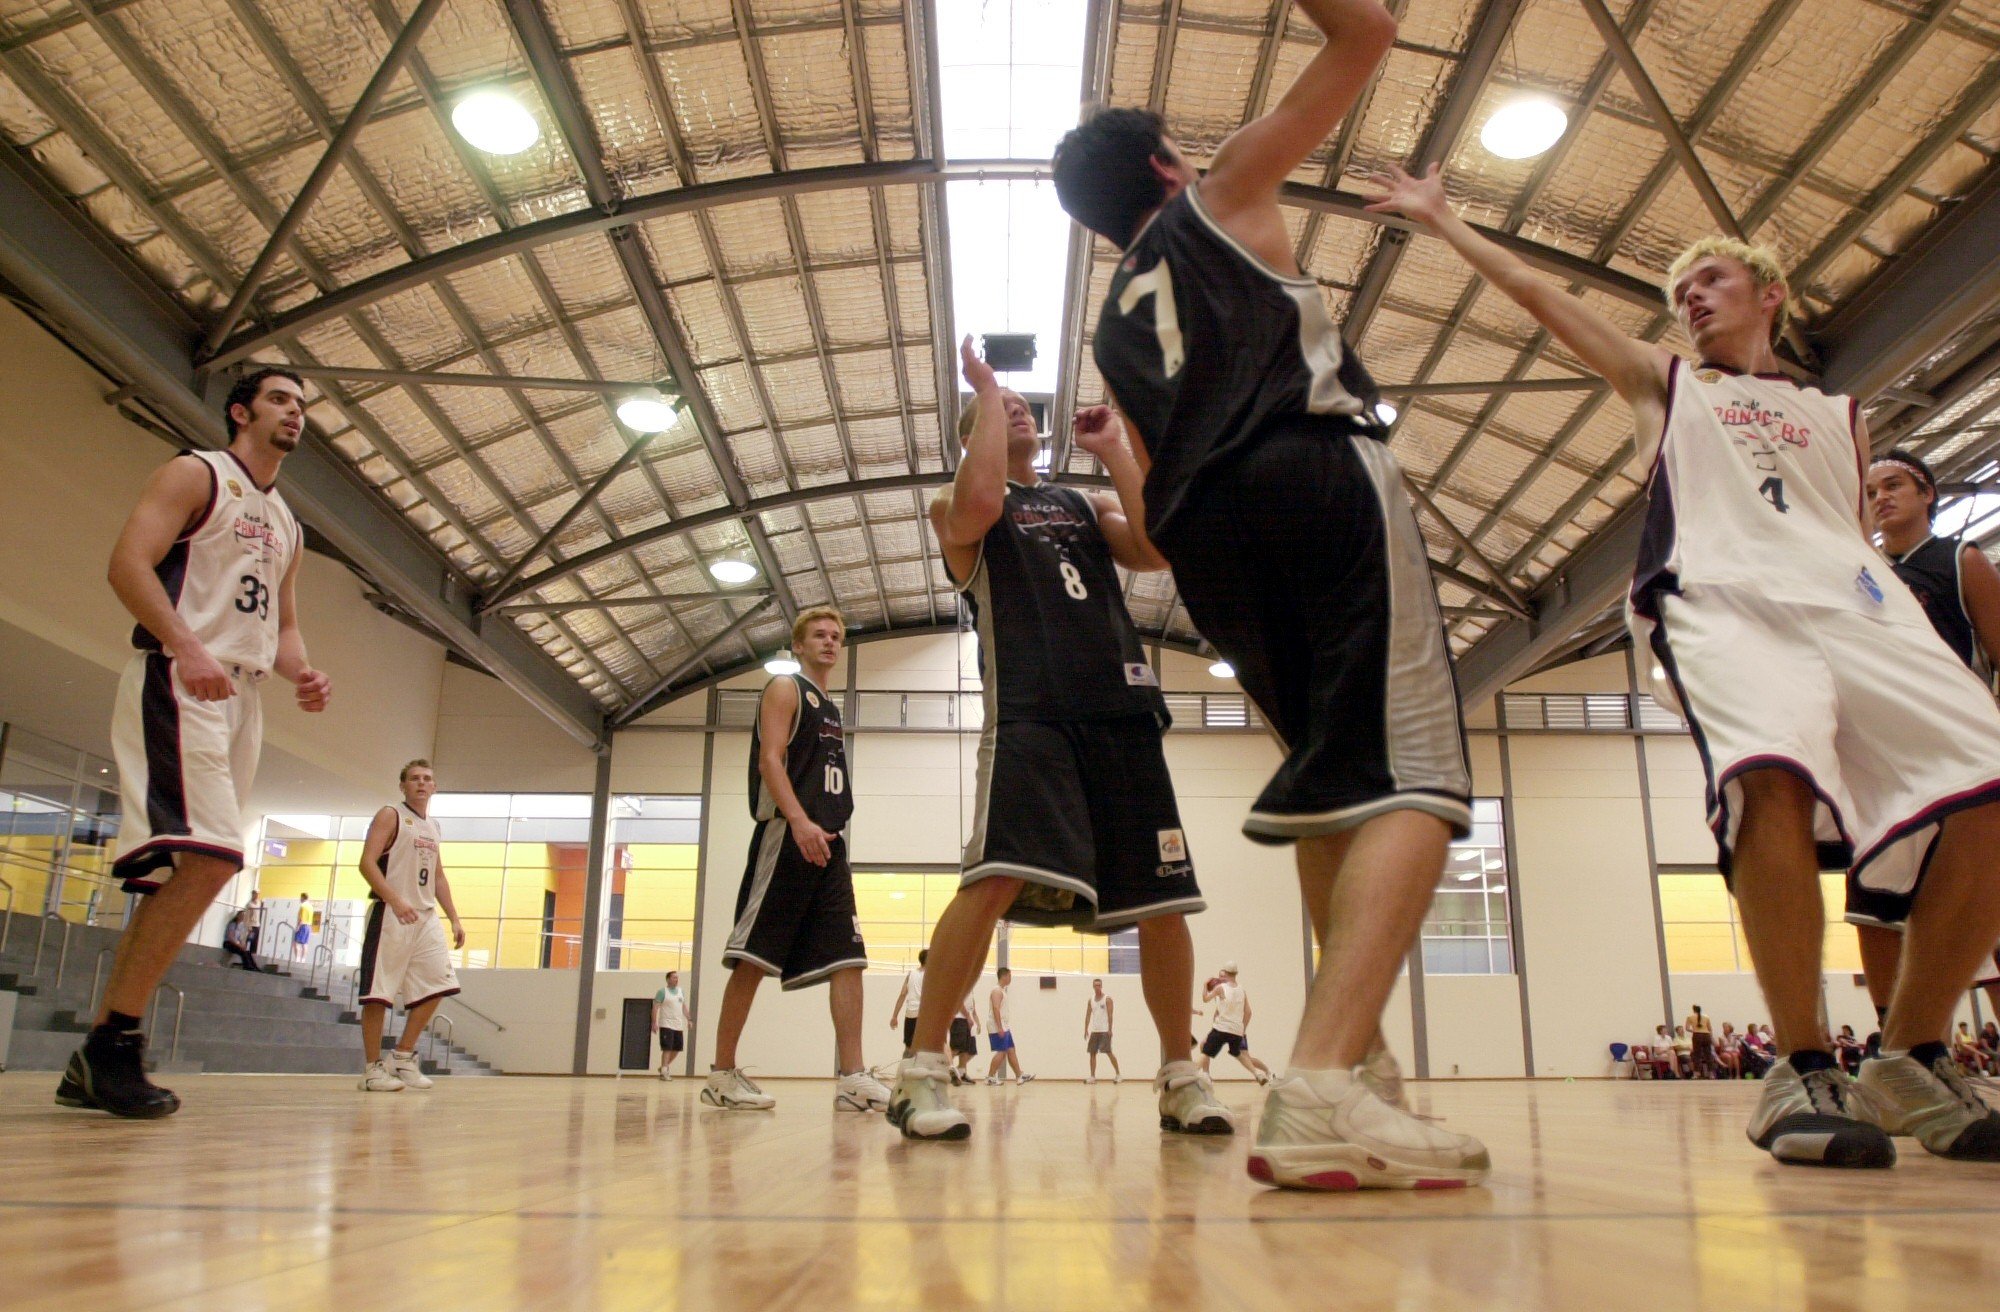 basketball-at-blacktown-leisure-centre-stanhope